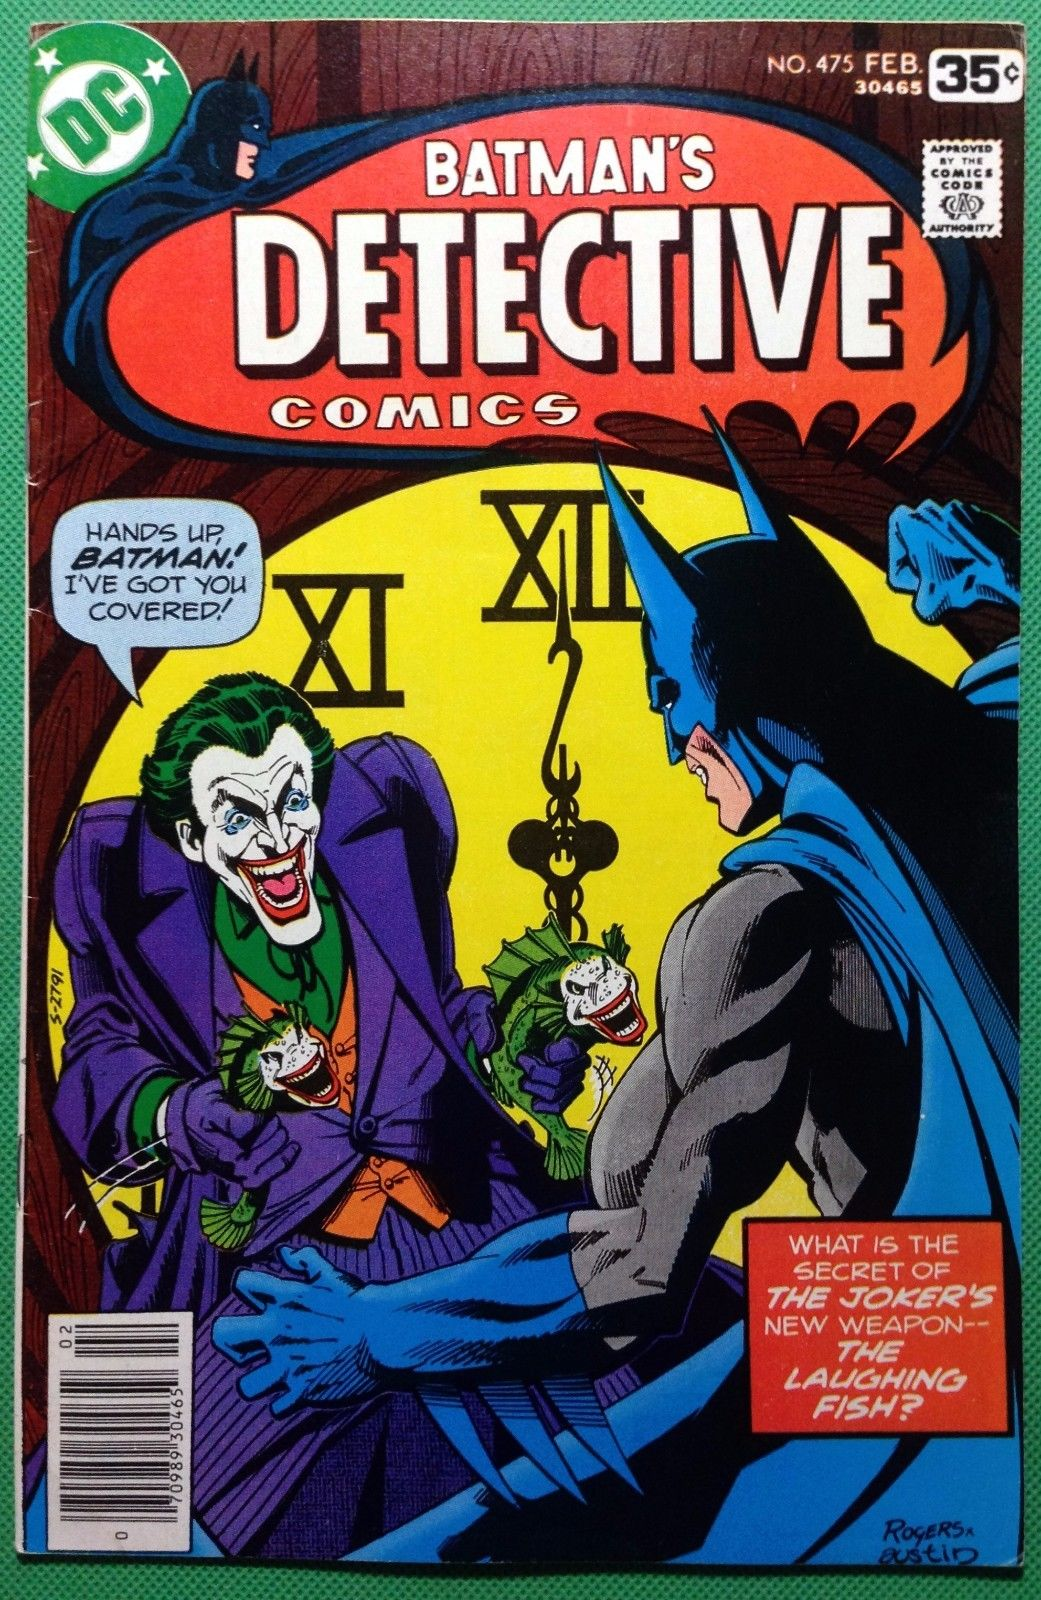 APR120882 - SIMPSONS COMICS #191 - Kids Comics